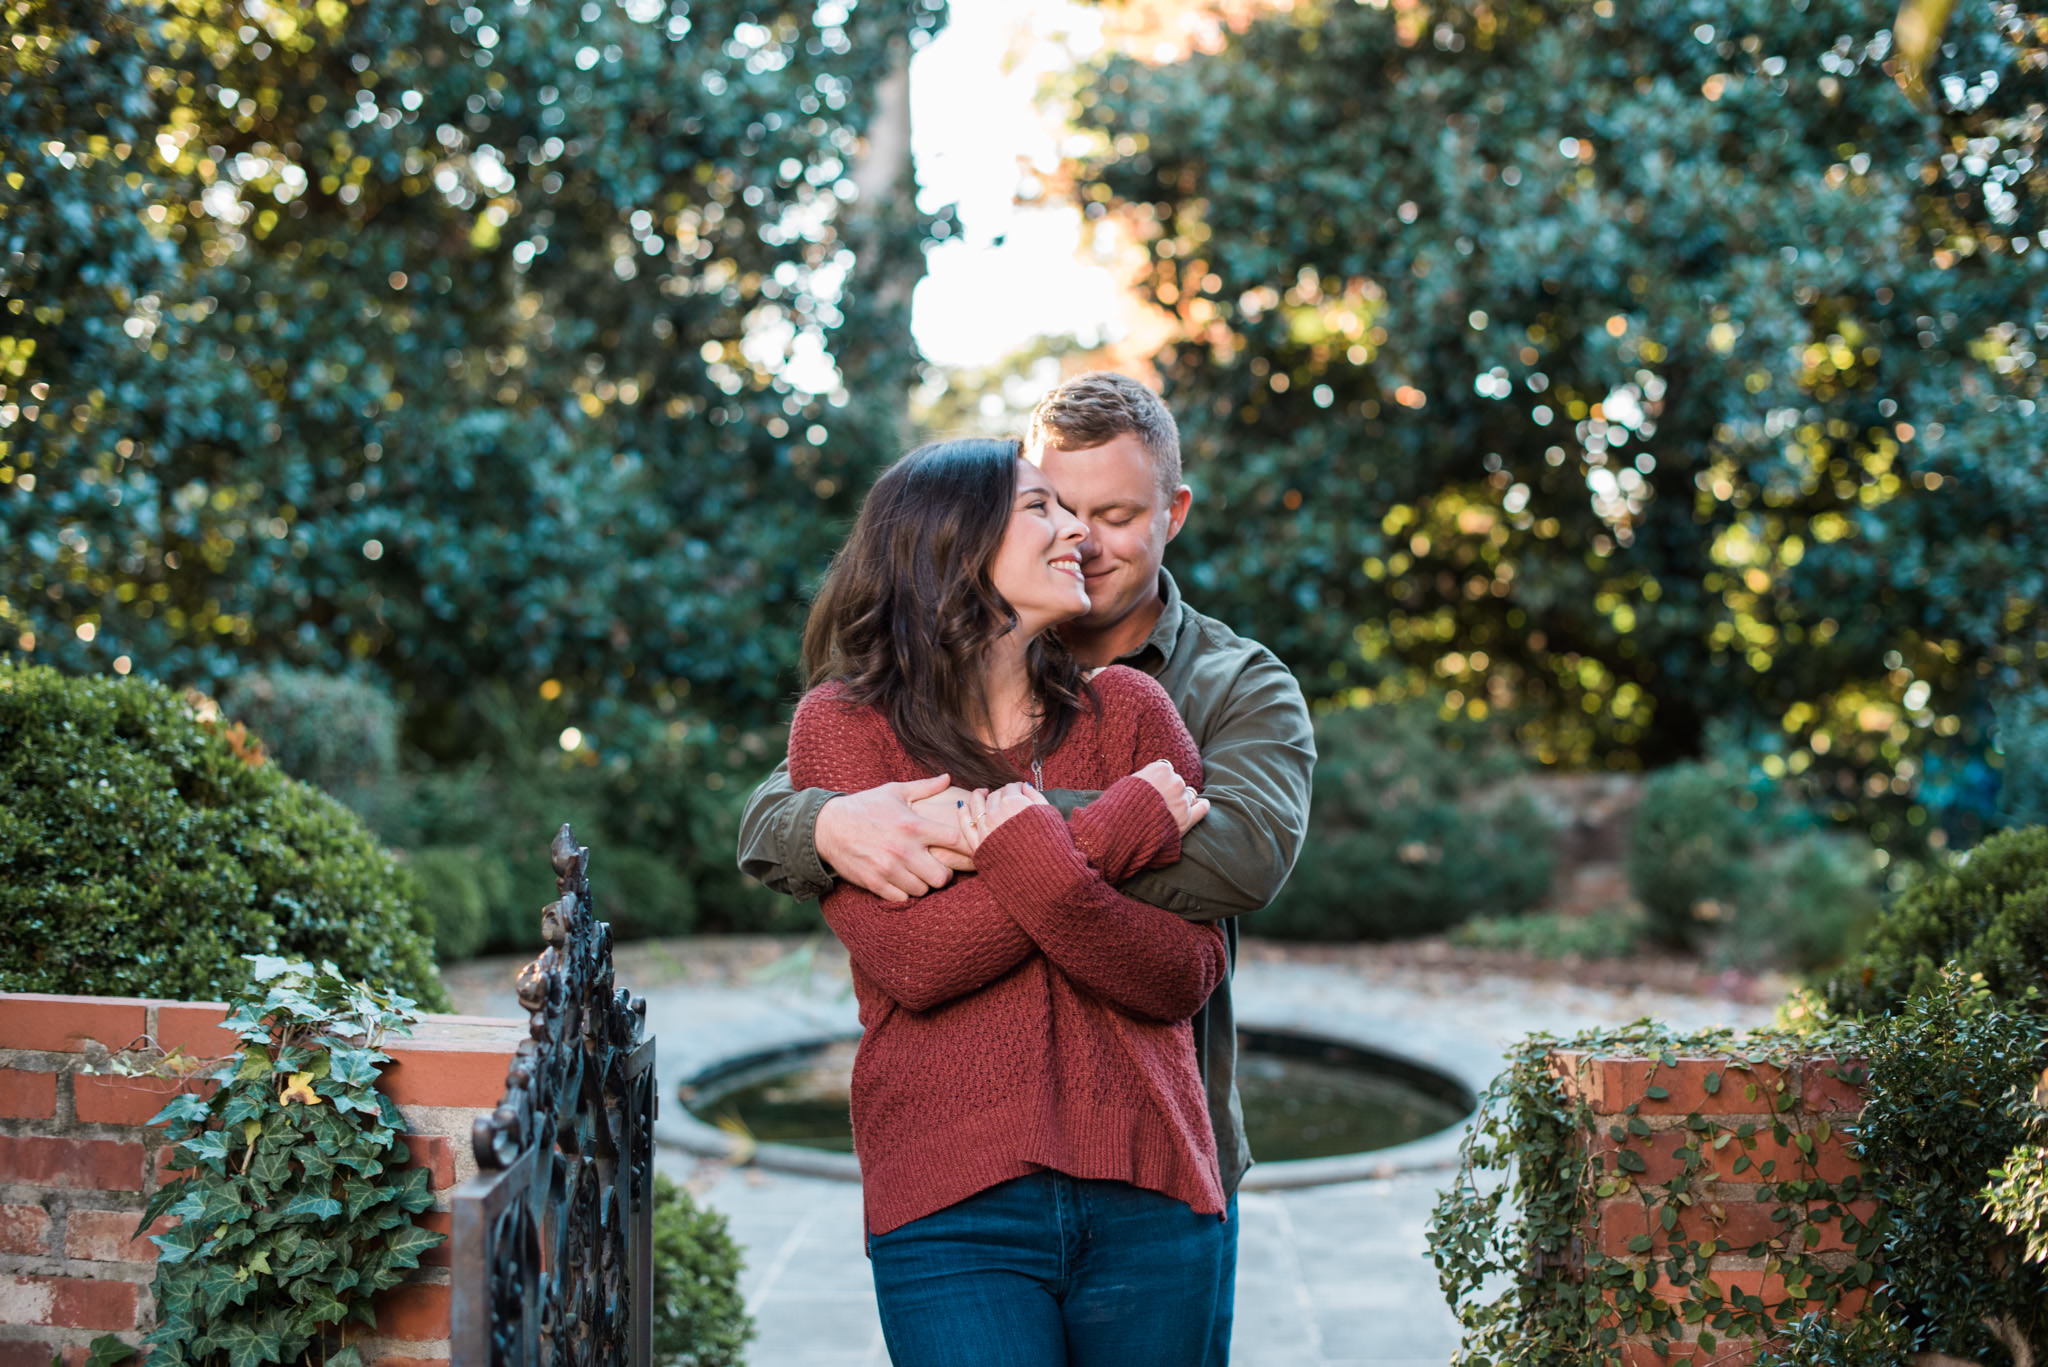 Athens-Founders-Garden-Engagement-4.jpg